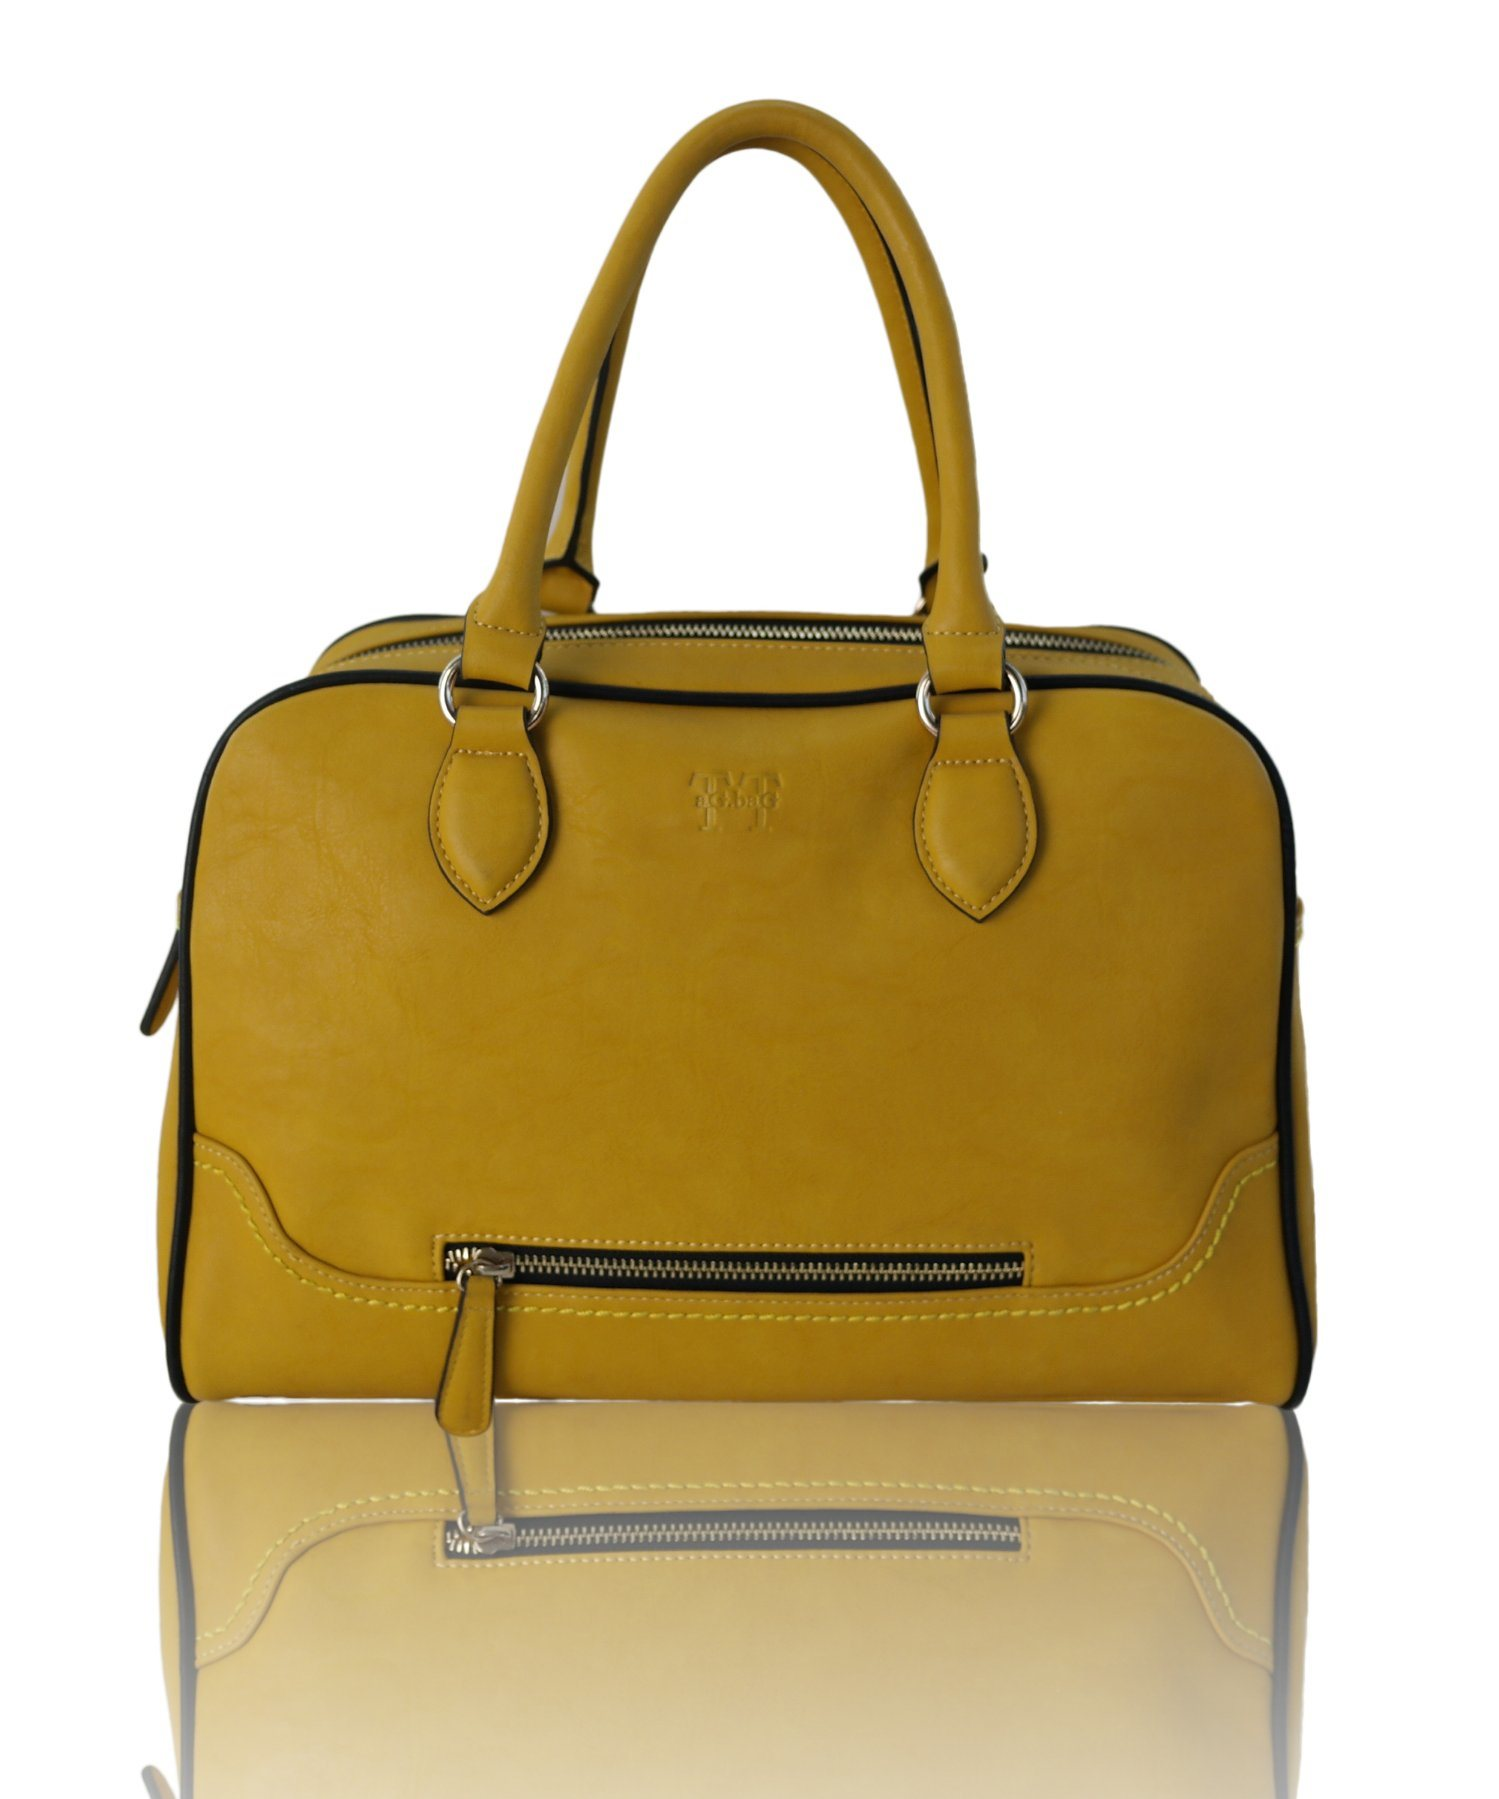 New Comming Woman Wholesale Fashion PU Leather Handbags